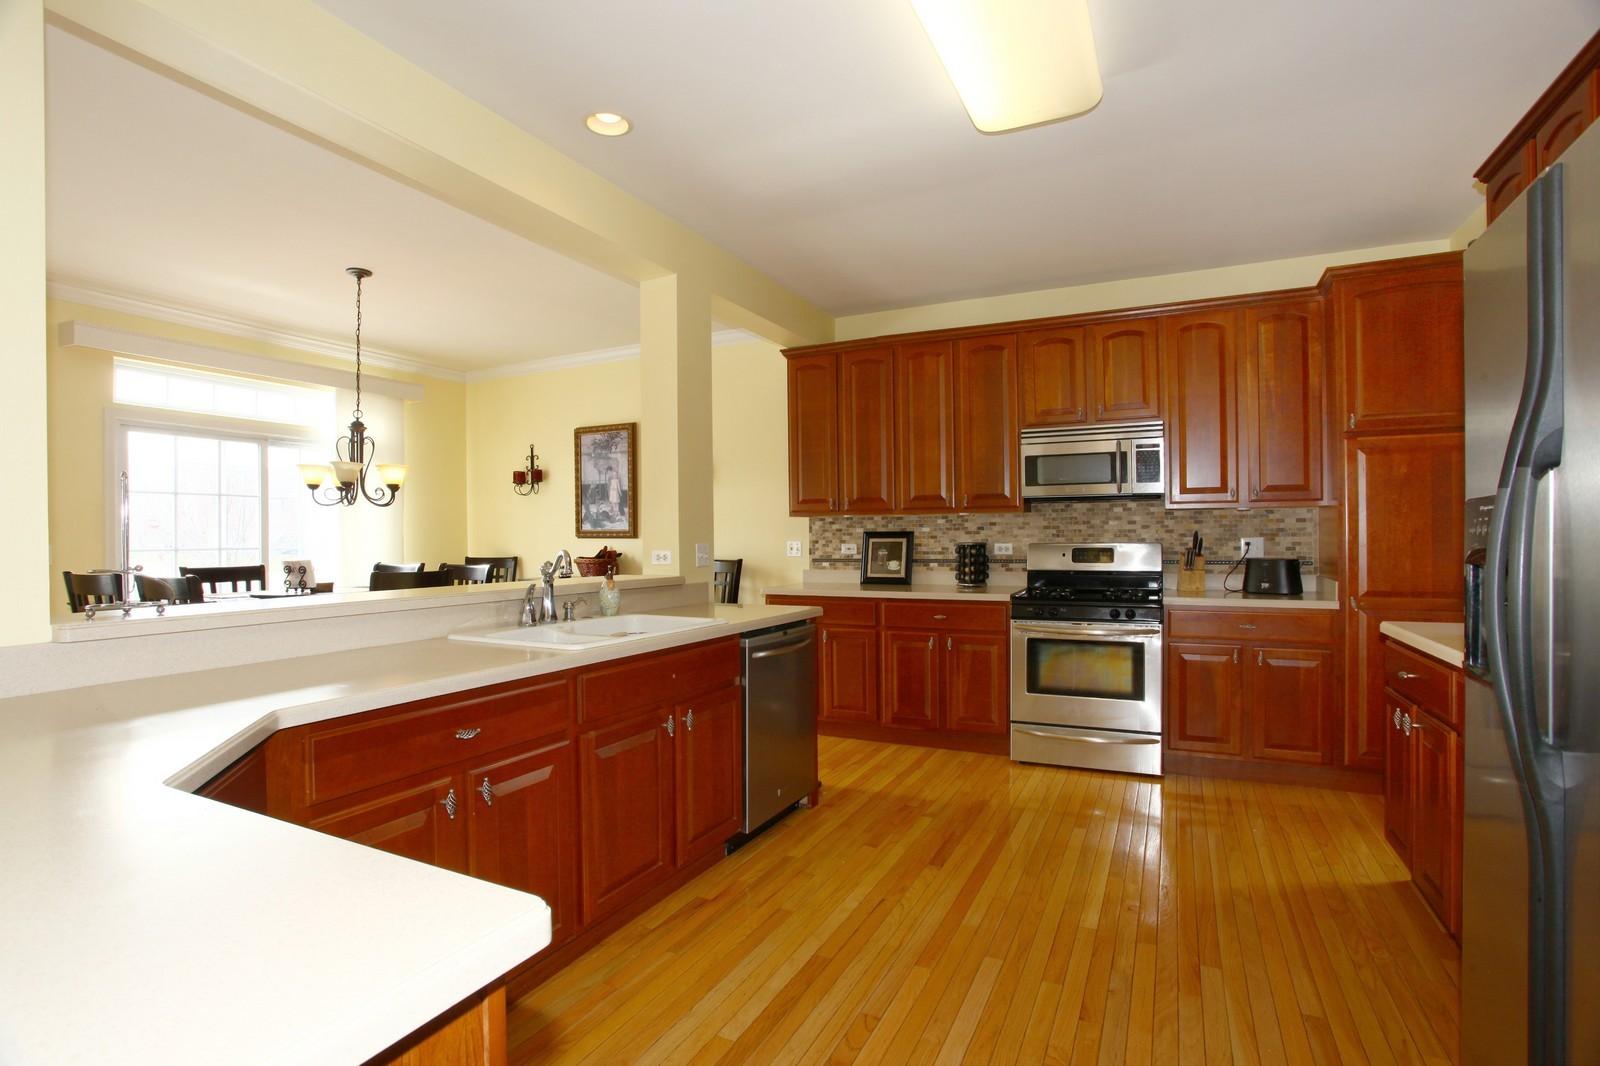 Real Estate Photography - 3298 Fieldstone Dr, Geneva, IL, 60134 - Kitchen